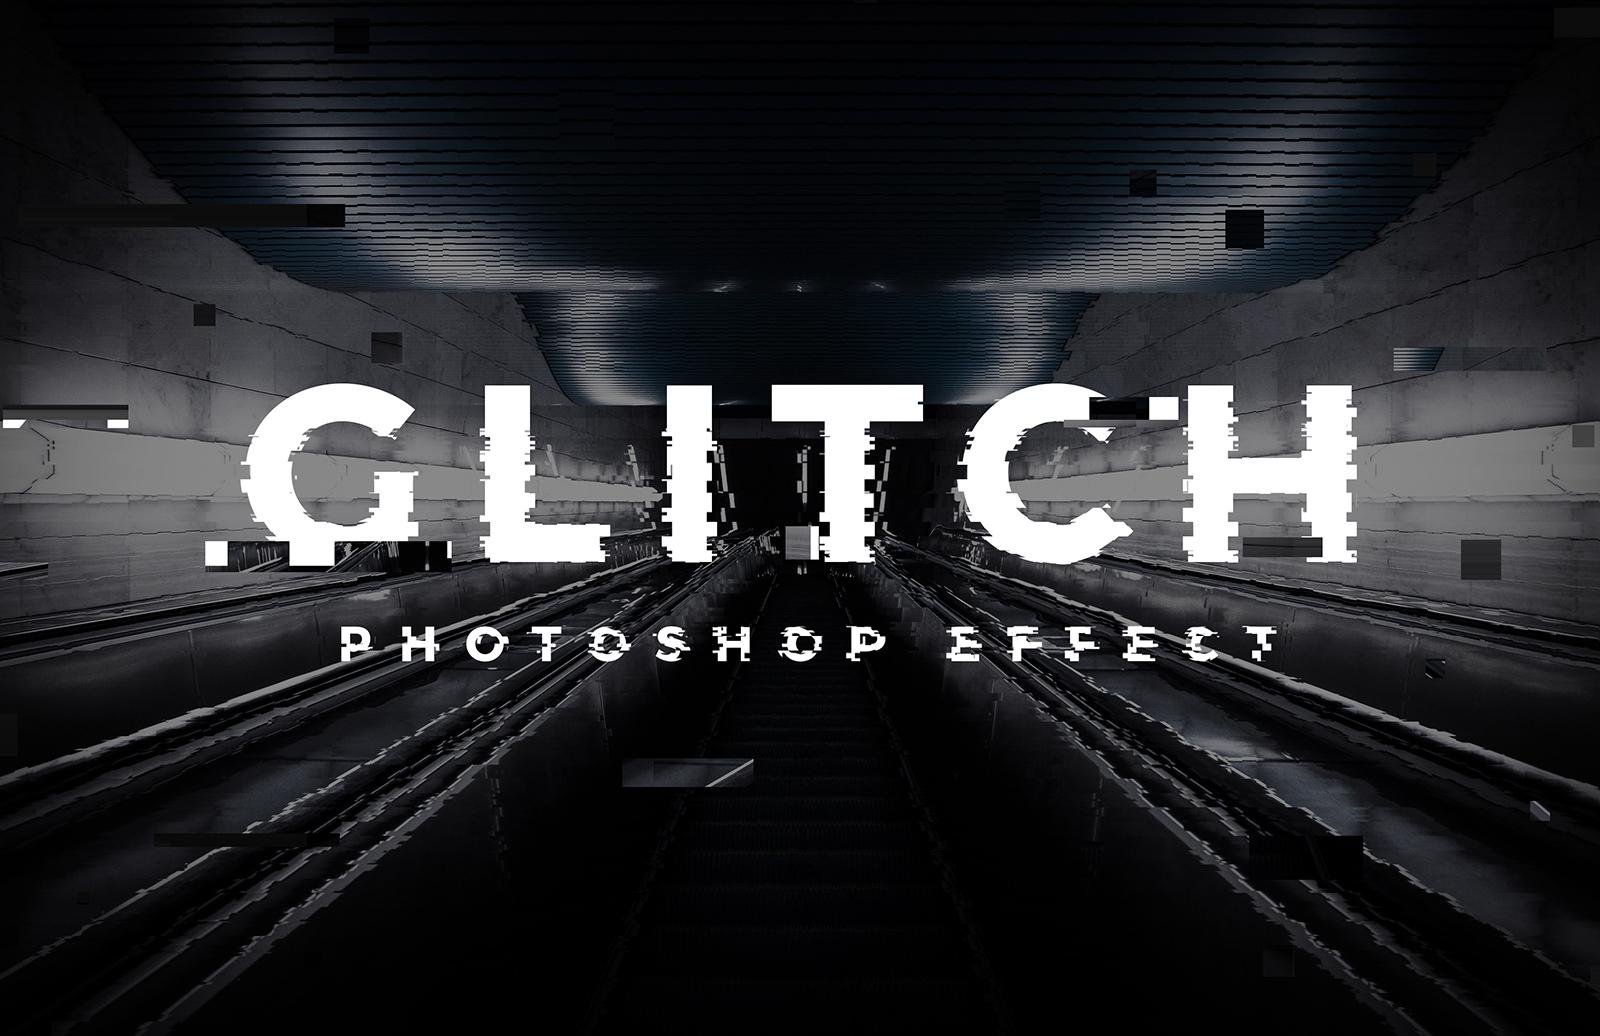 Glitch Image Effect Generator V2 1